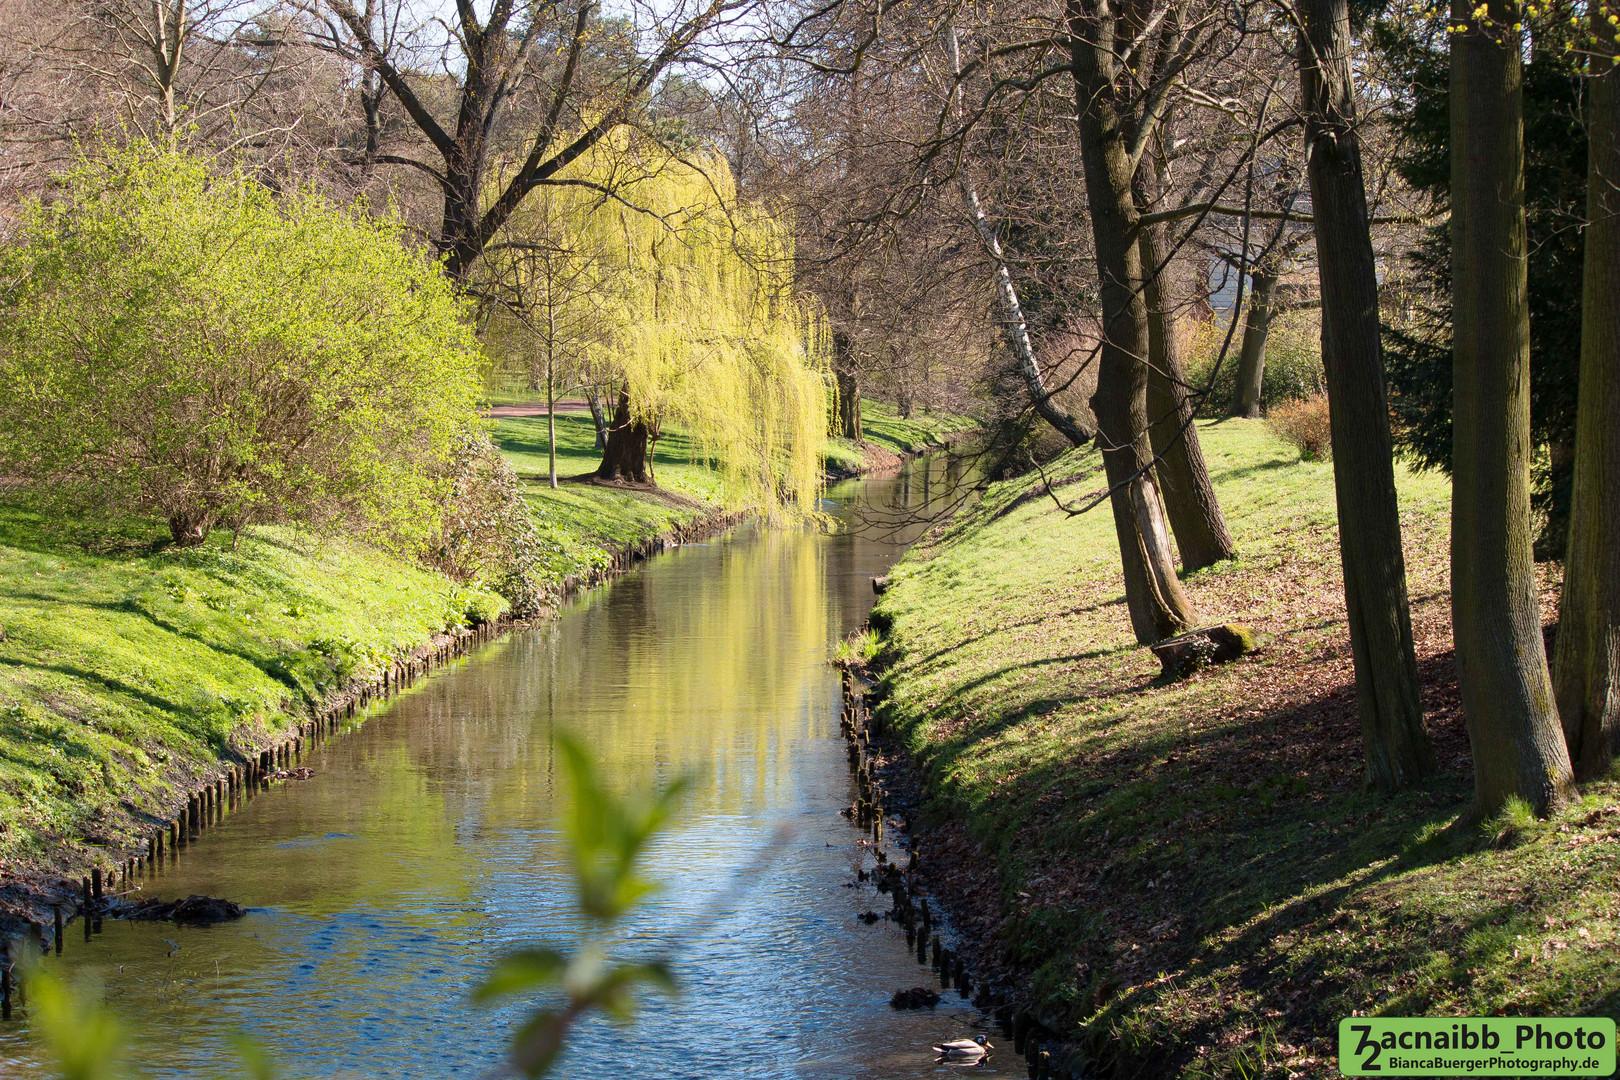 Bürgerpark in Berlin-Pankow